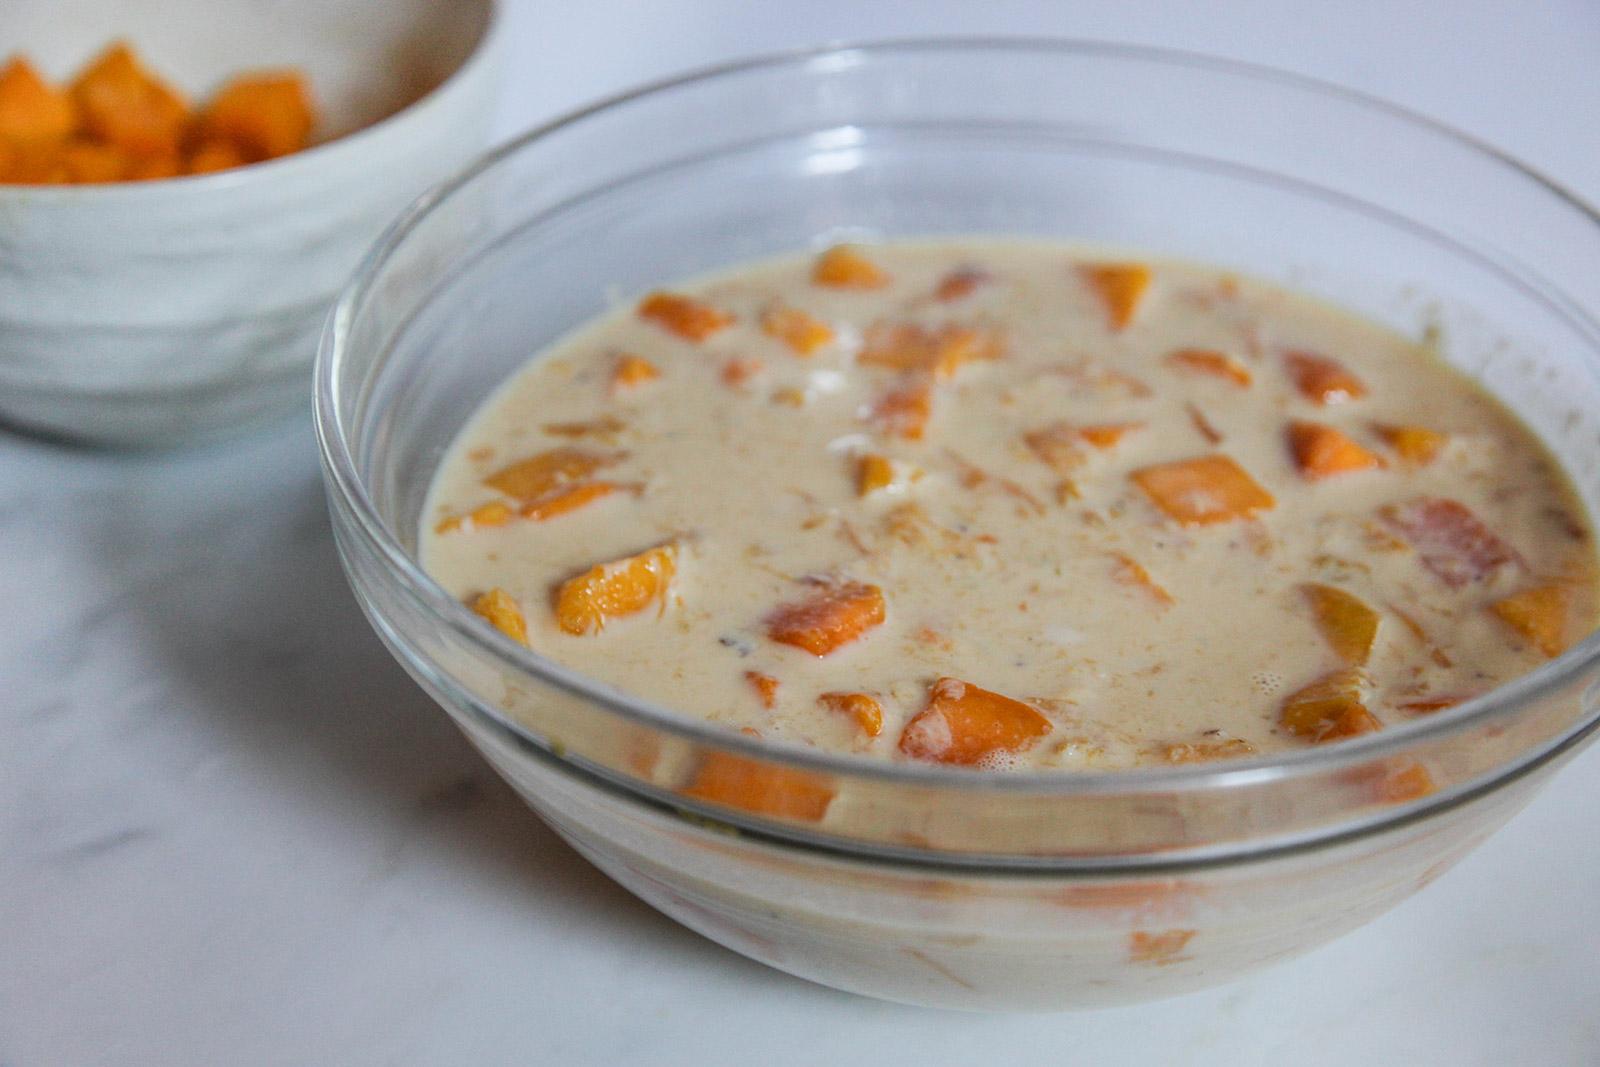 Simple heavenly dessert of sweet mango in thick creamy milk